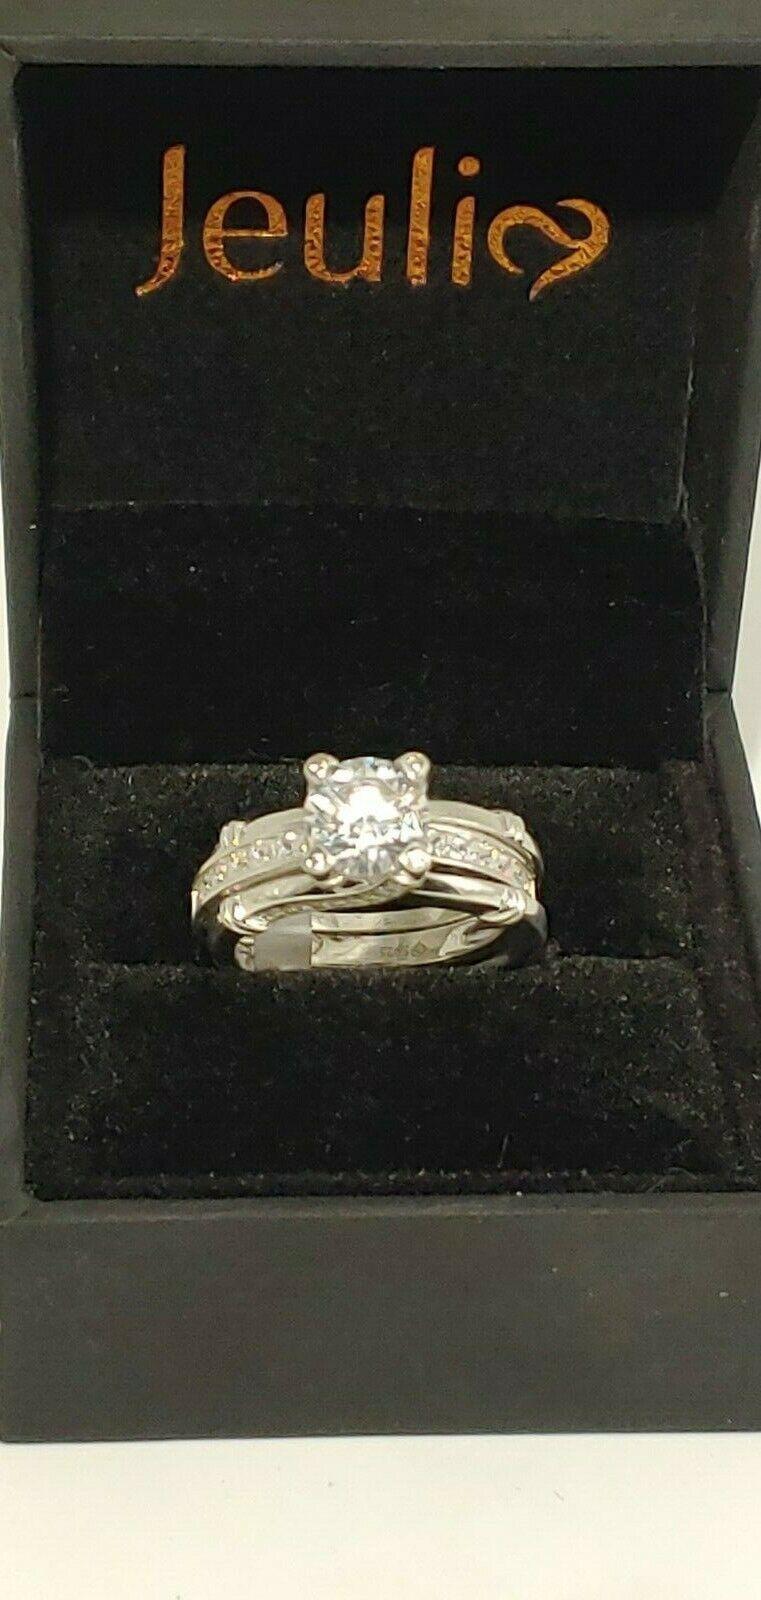 Woman's Round Cut Diamond Size 9 Rings Interchangeable Wedding Engagement Set